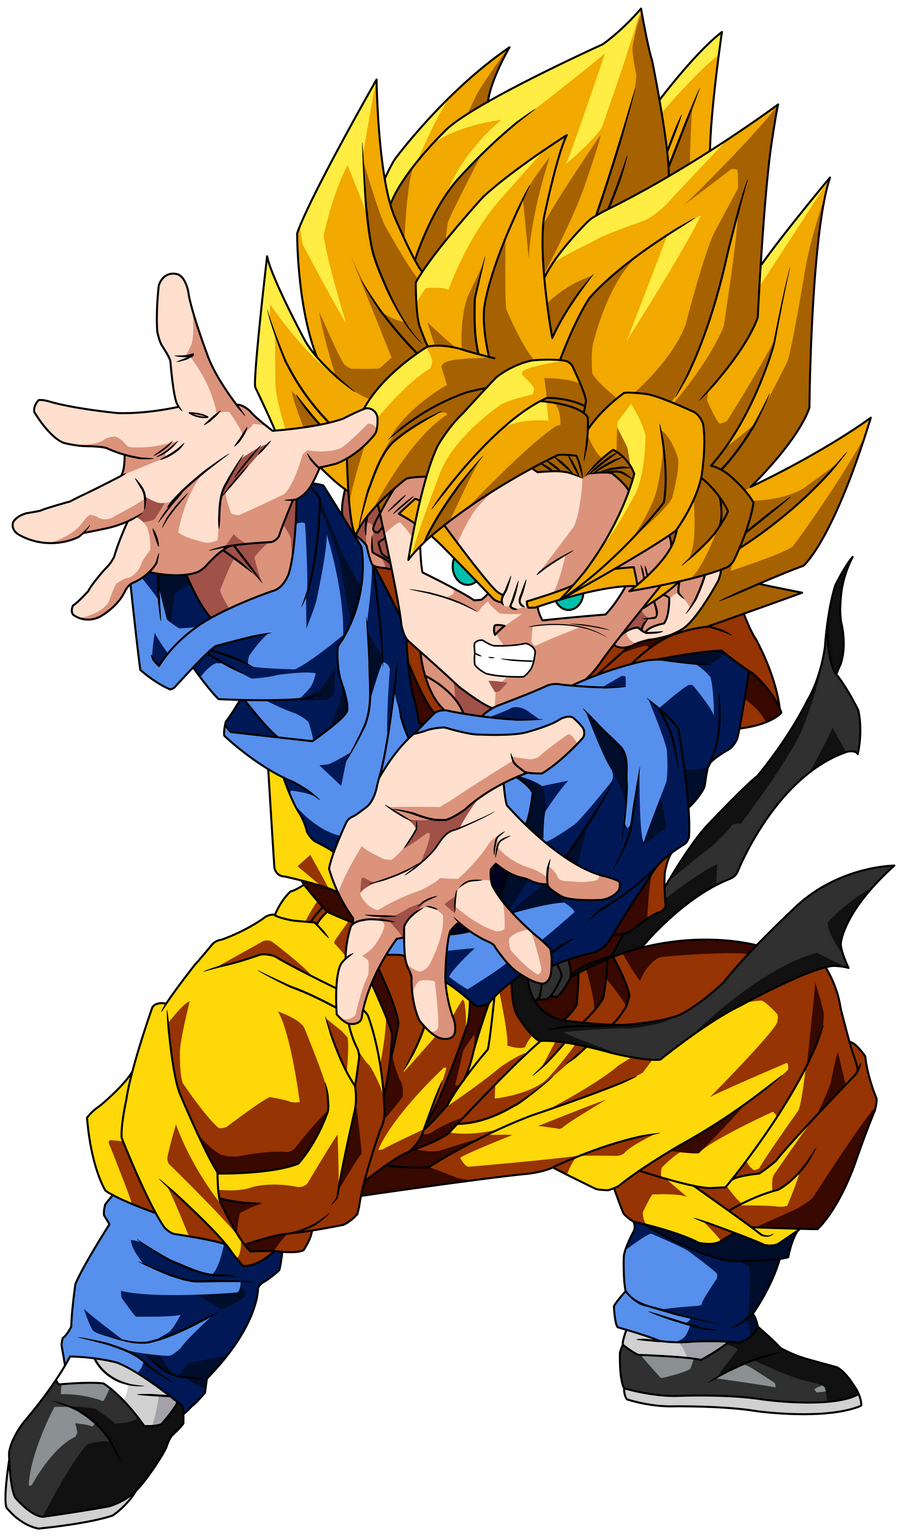 Dragon Ball Z Goten and Trunks Super Saiyan